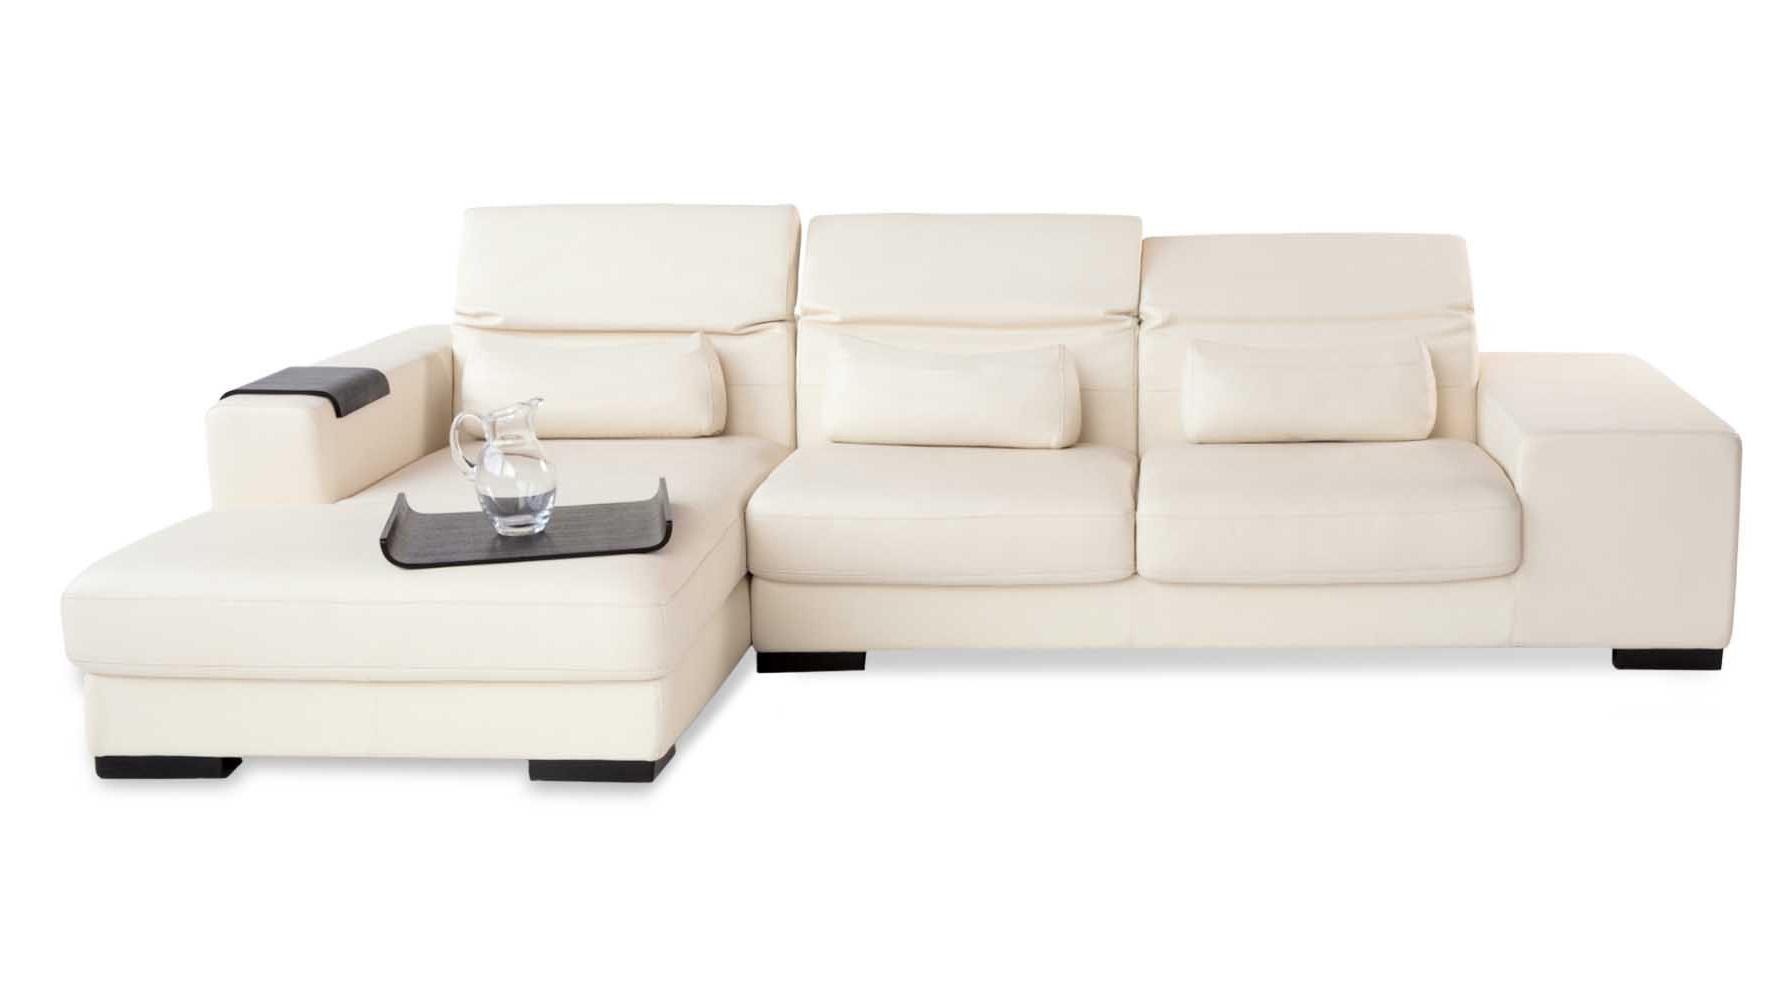 US Pride Sierra Corduroy Sectional Sofa With Storage Ottoman Left Sage